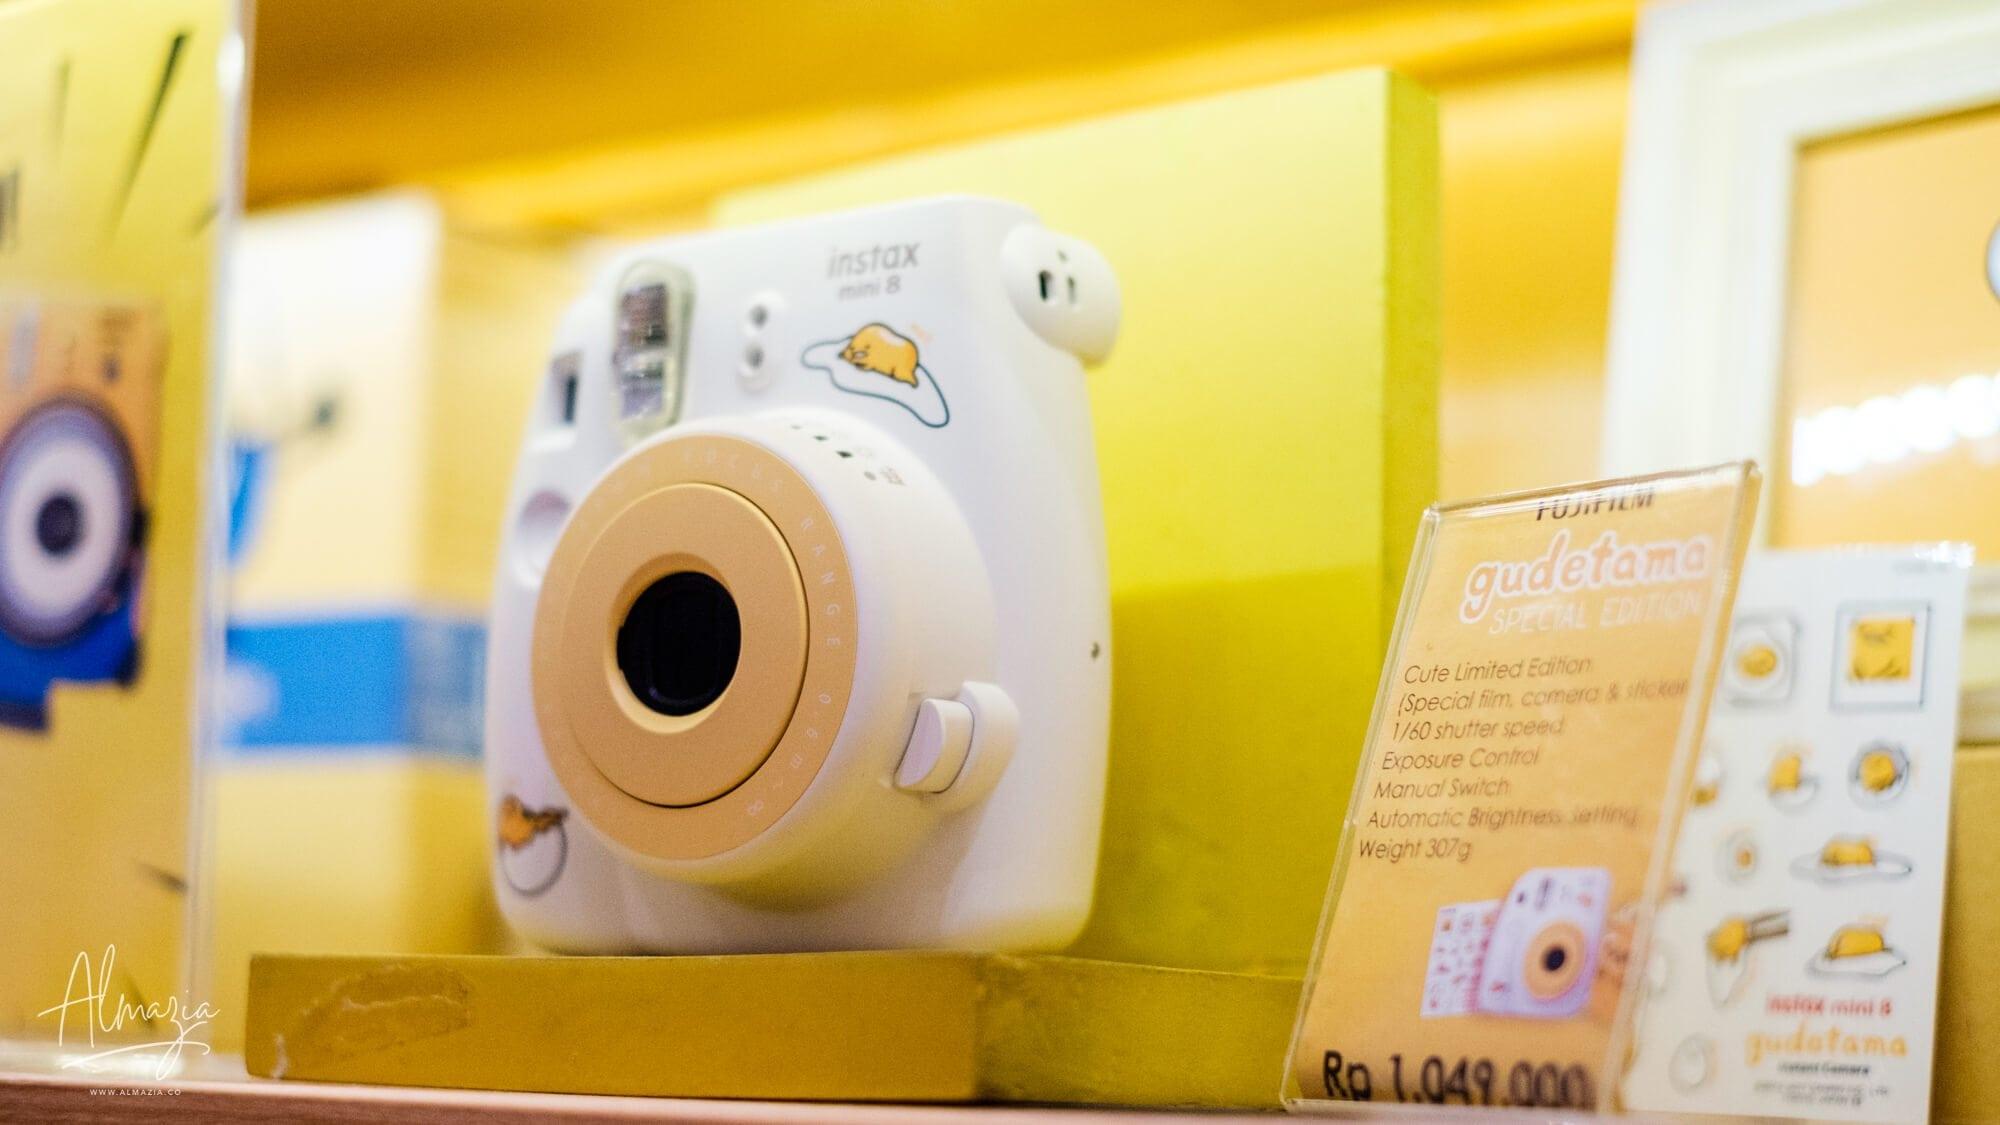 Kamera Fujifilm Instax Mini 8 Gudetama Special Edition